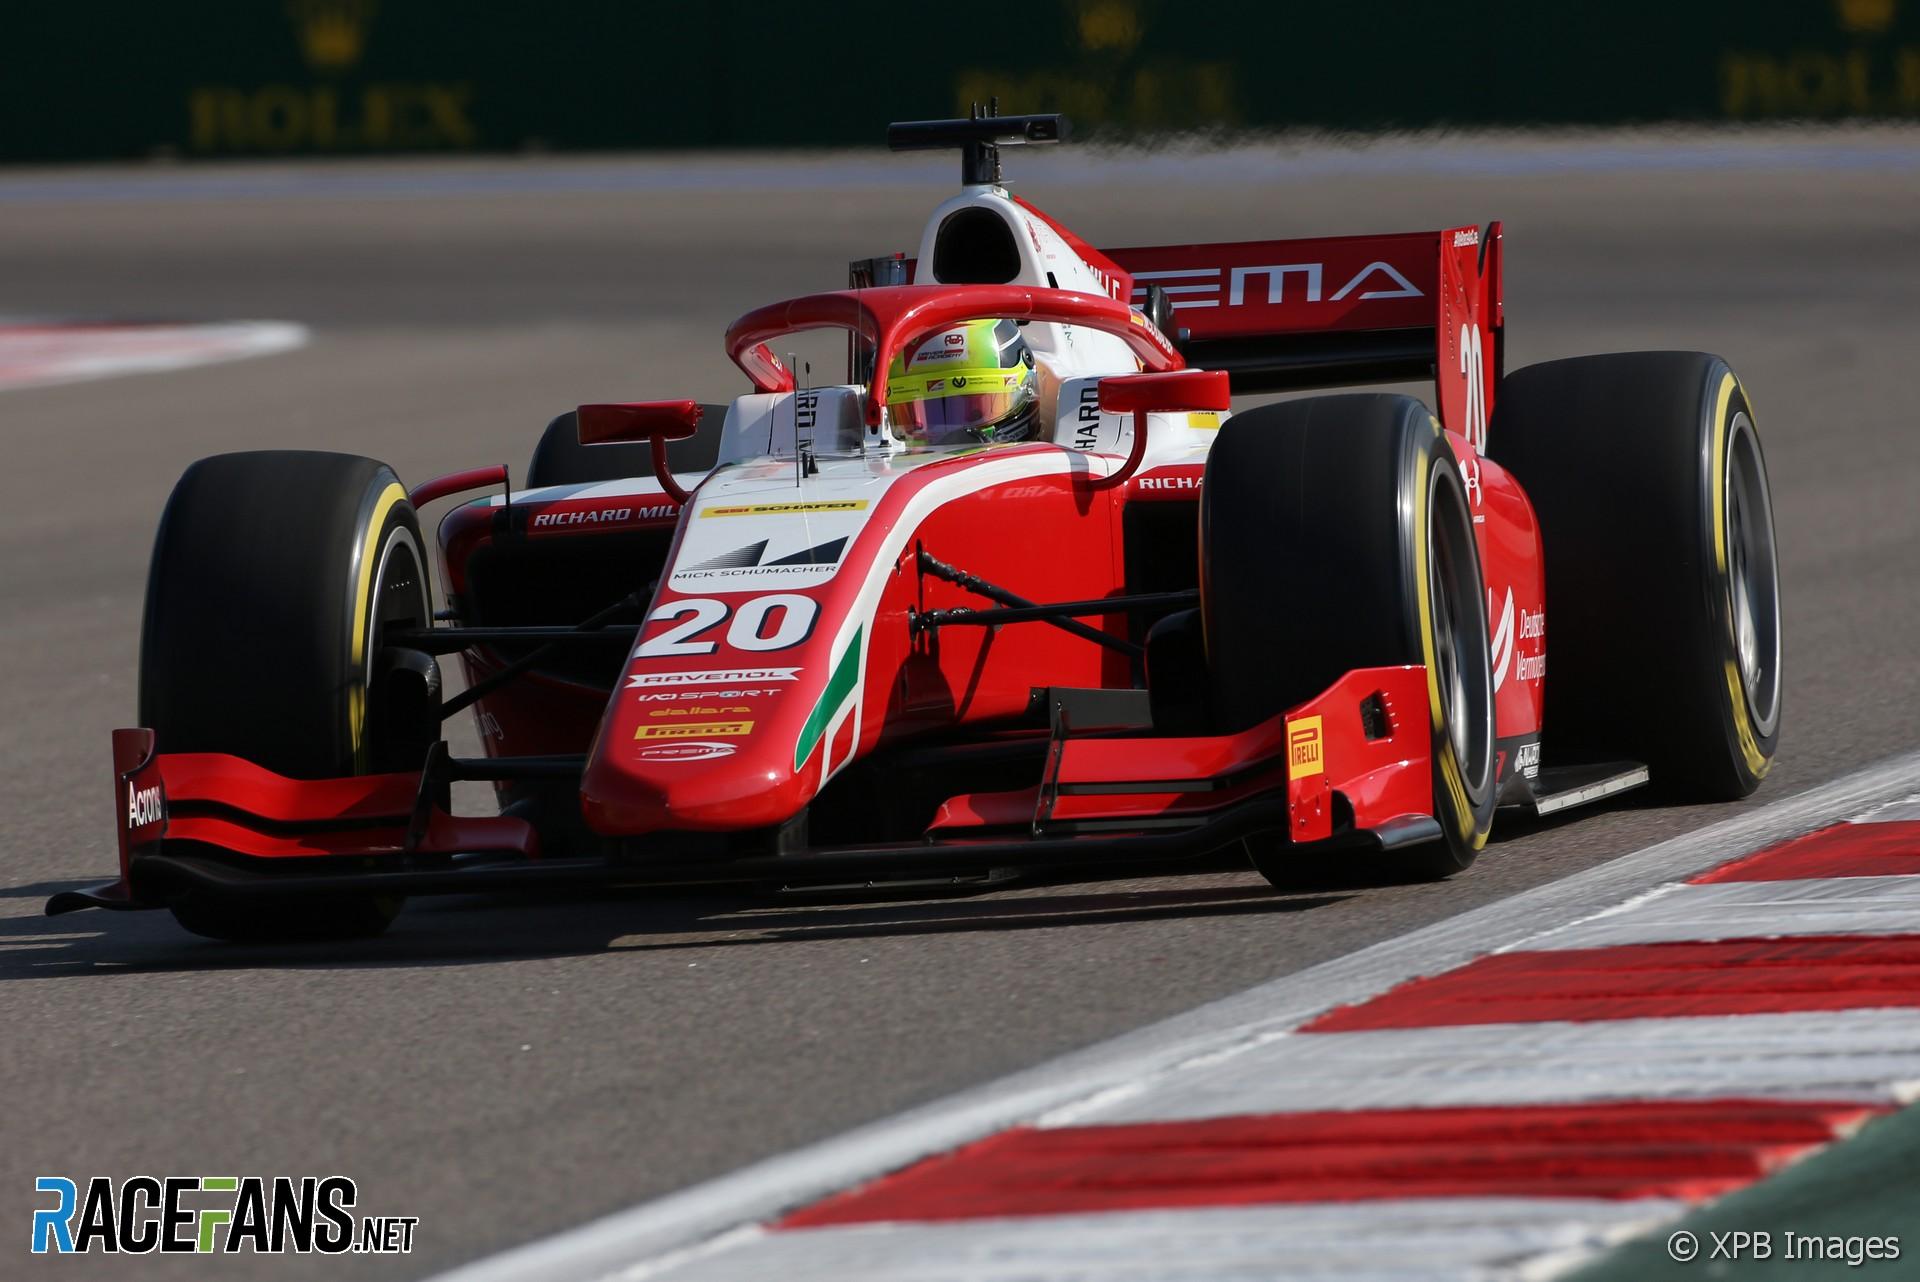 Mick Schumacher, Prema, Formula 2, Sochi, 2020